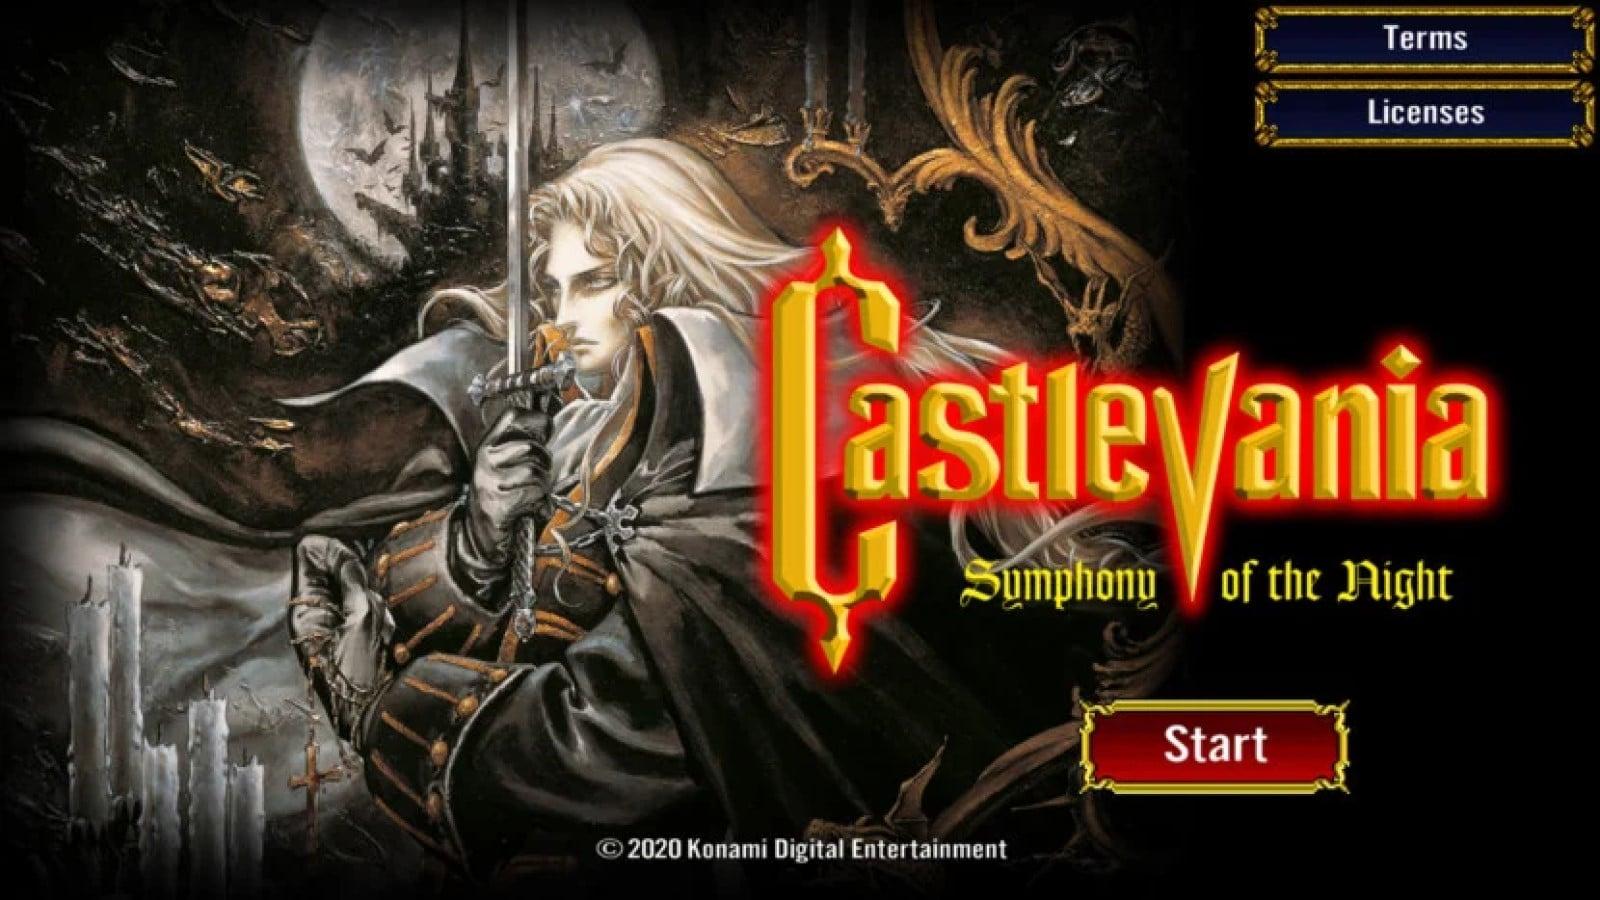 castlevania symphony of the night start screen